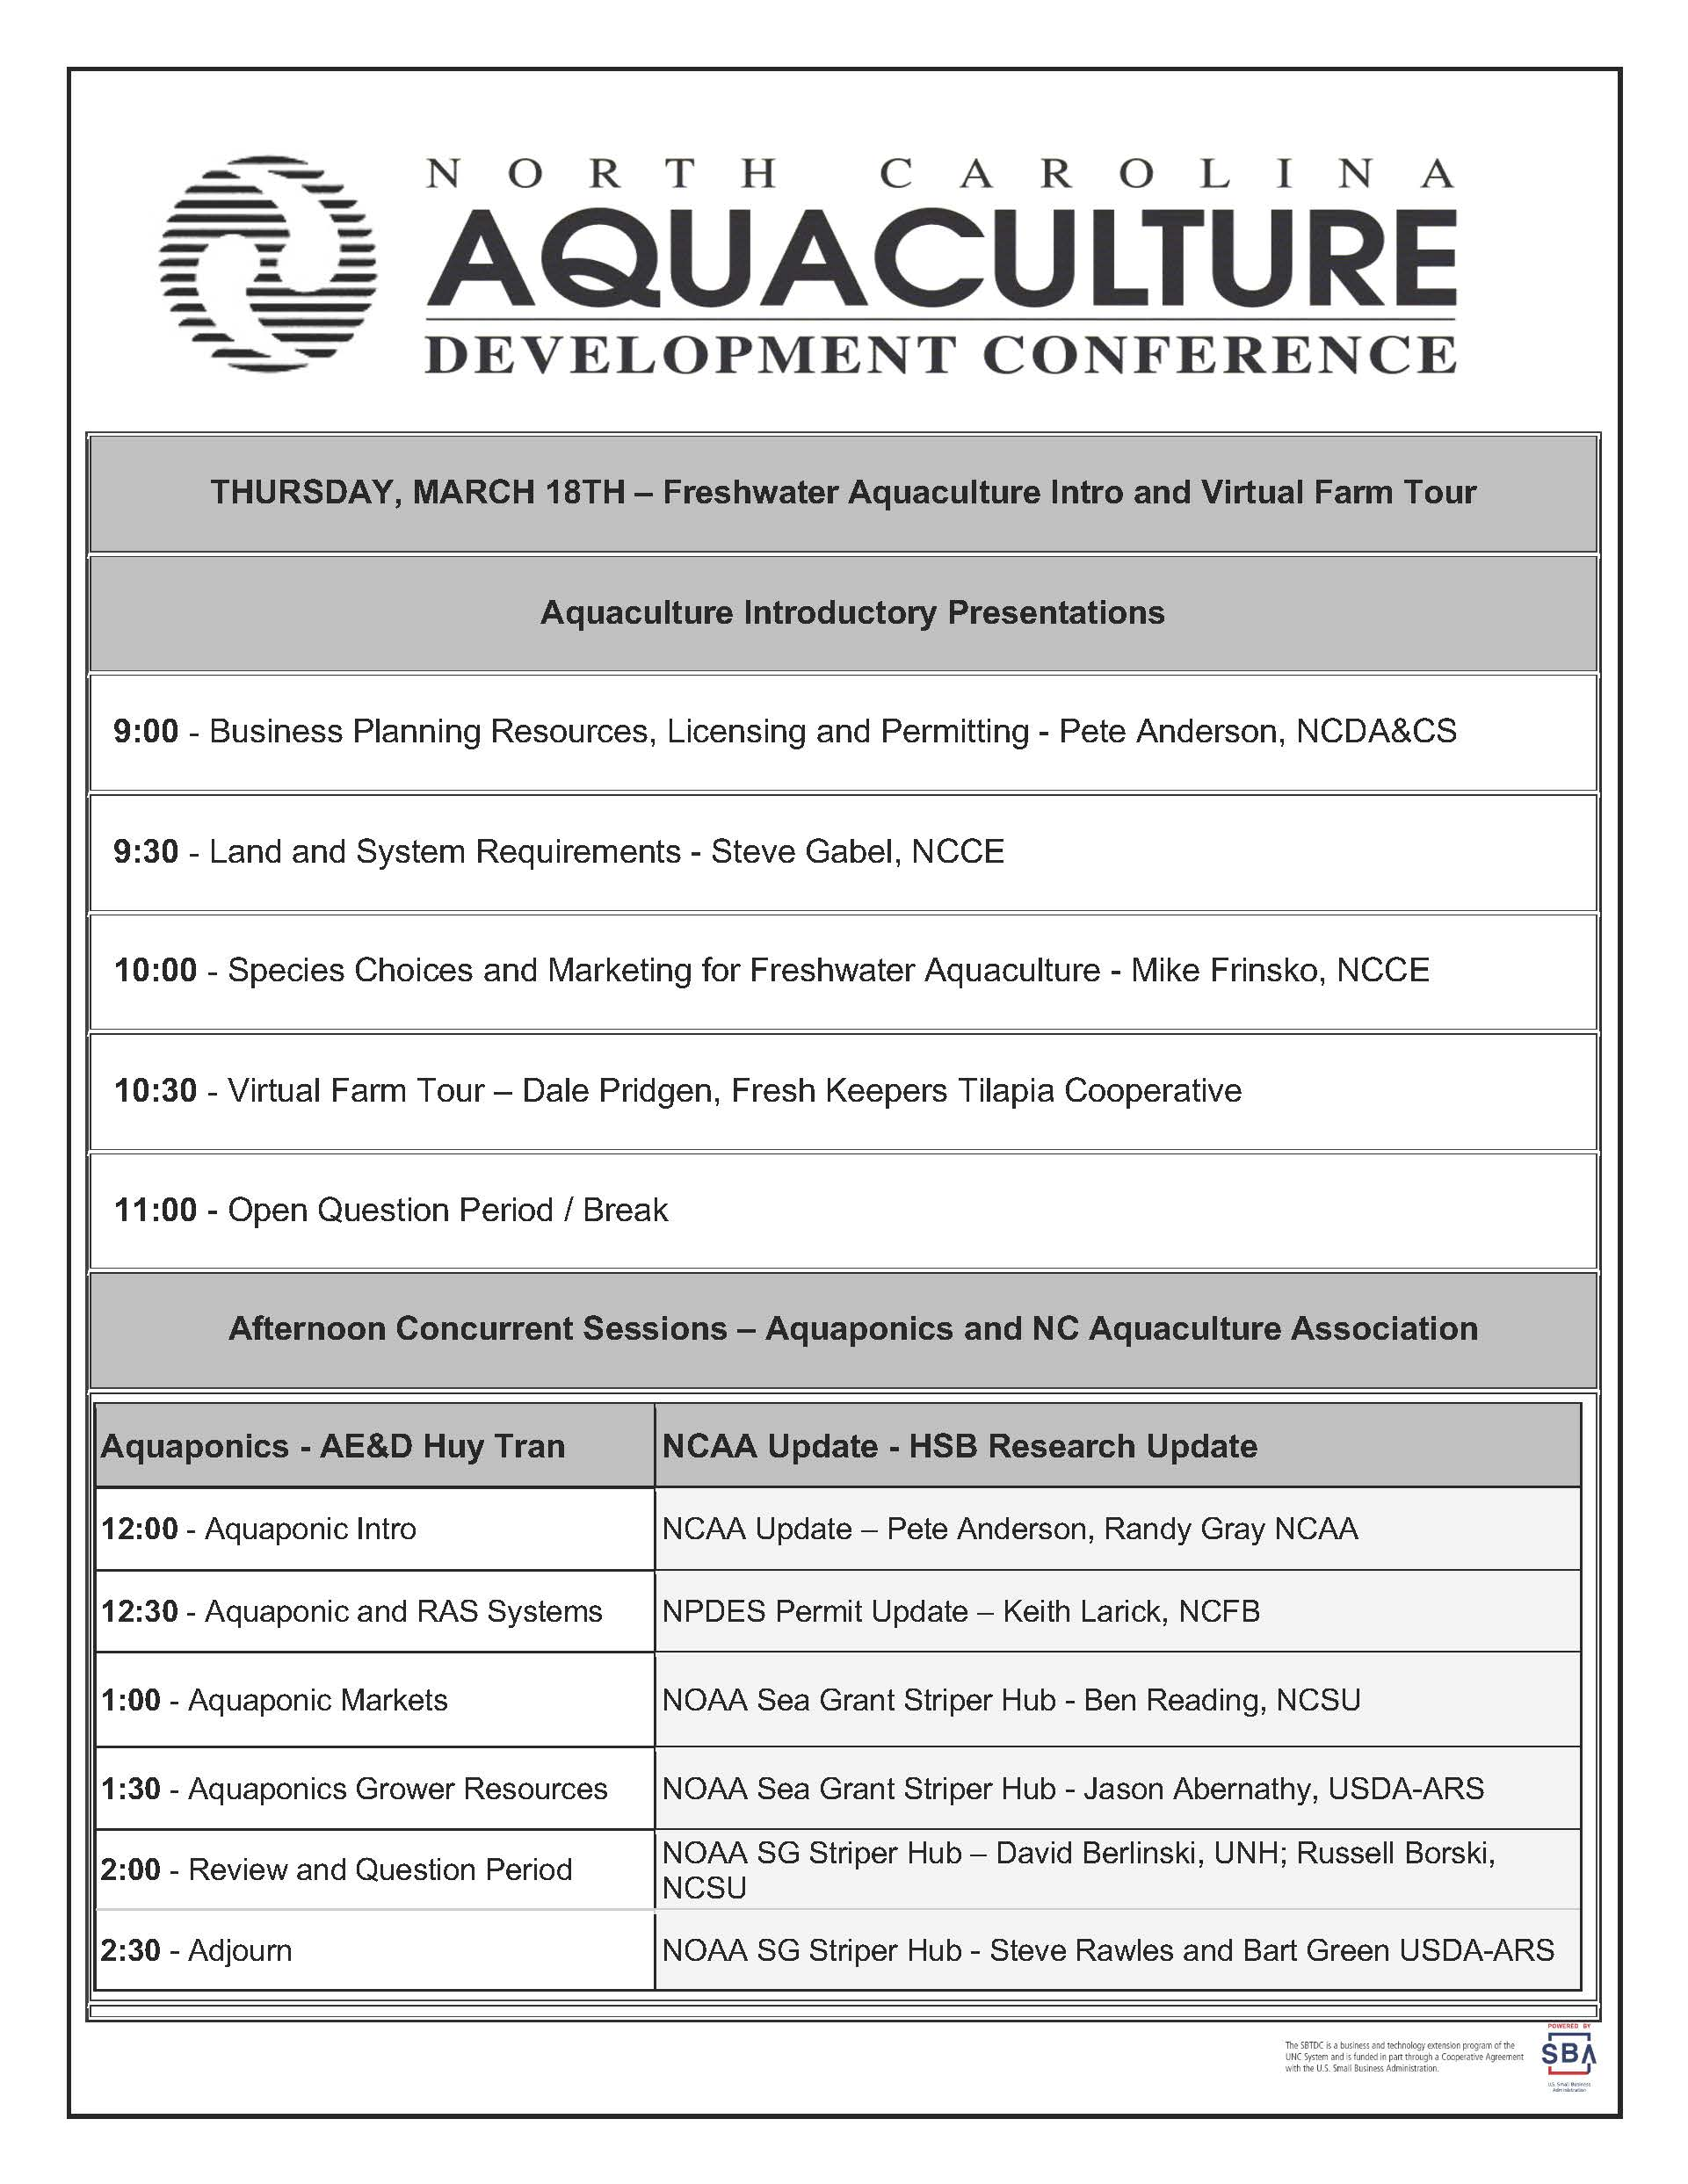 Thursday conference agenda